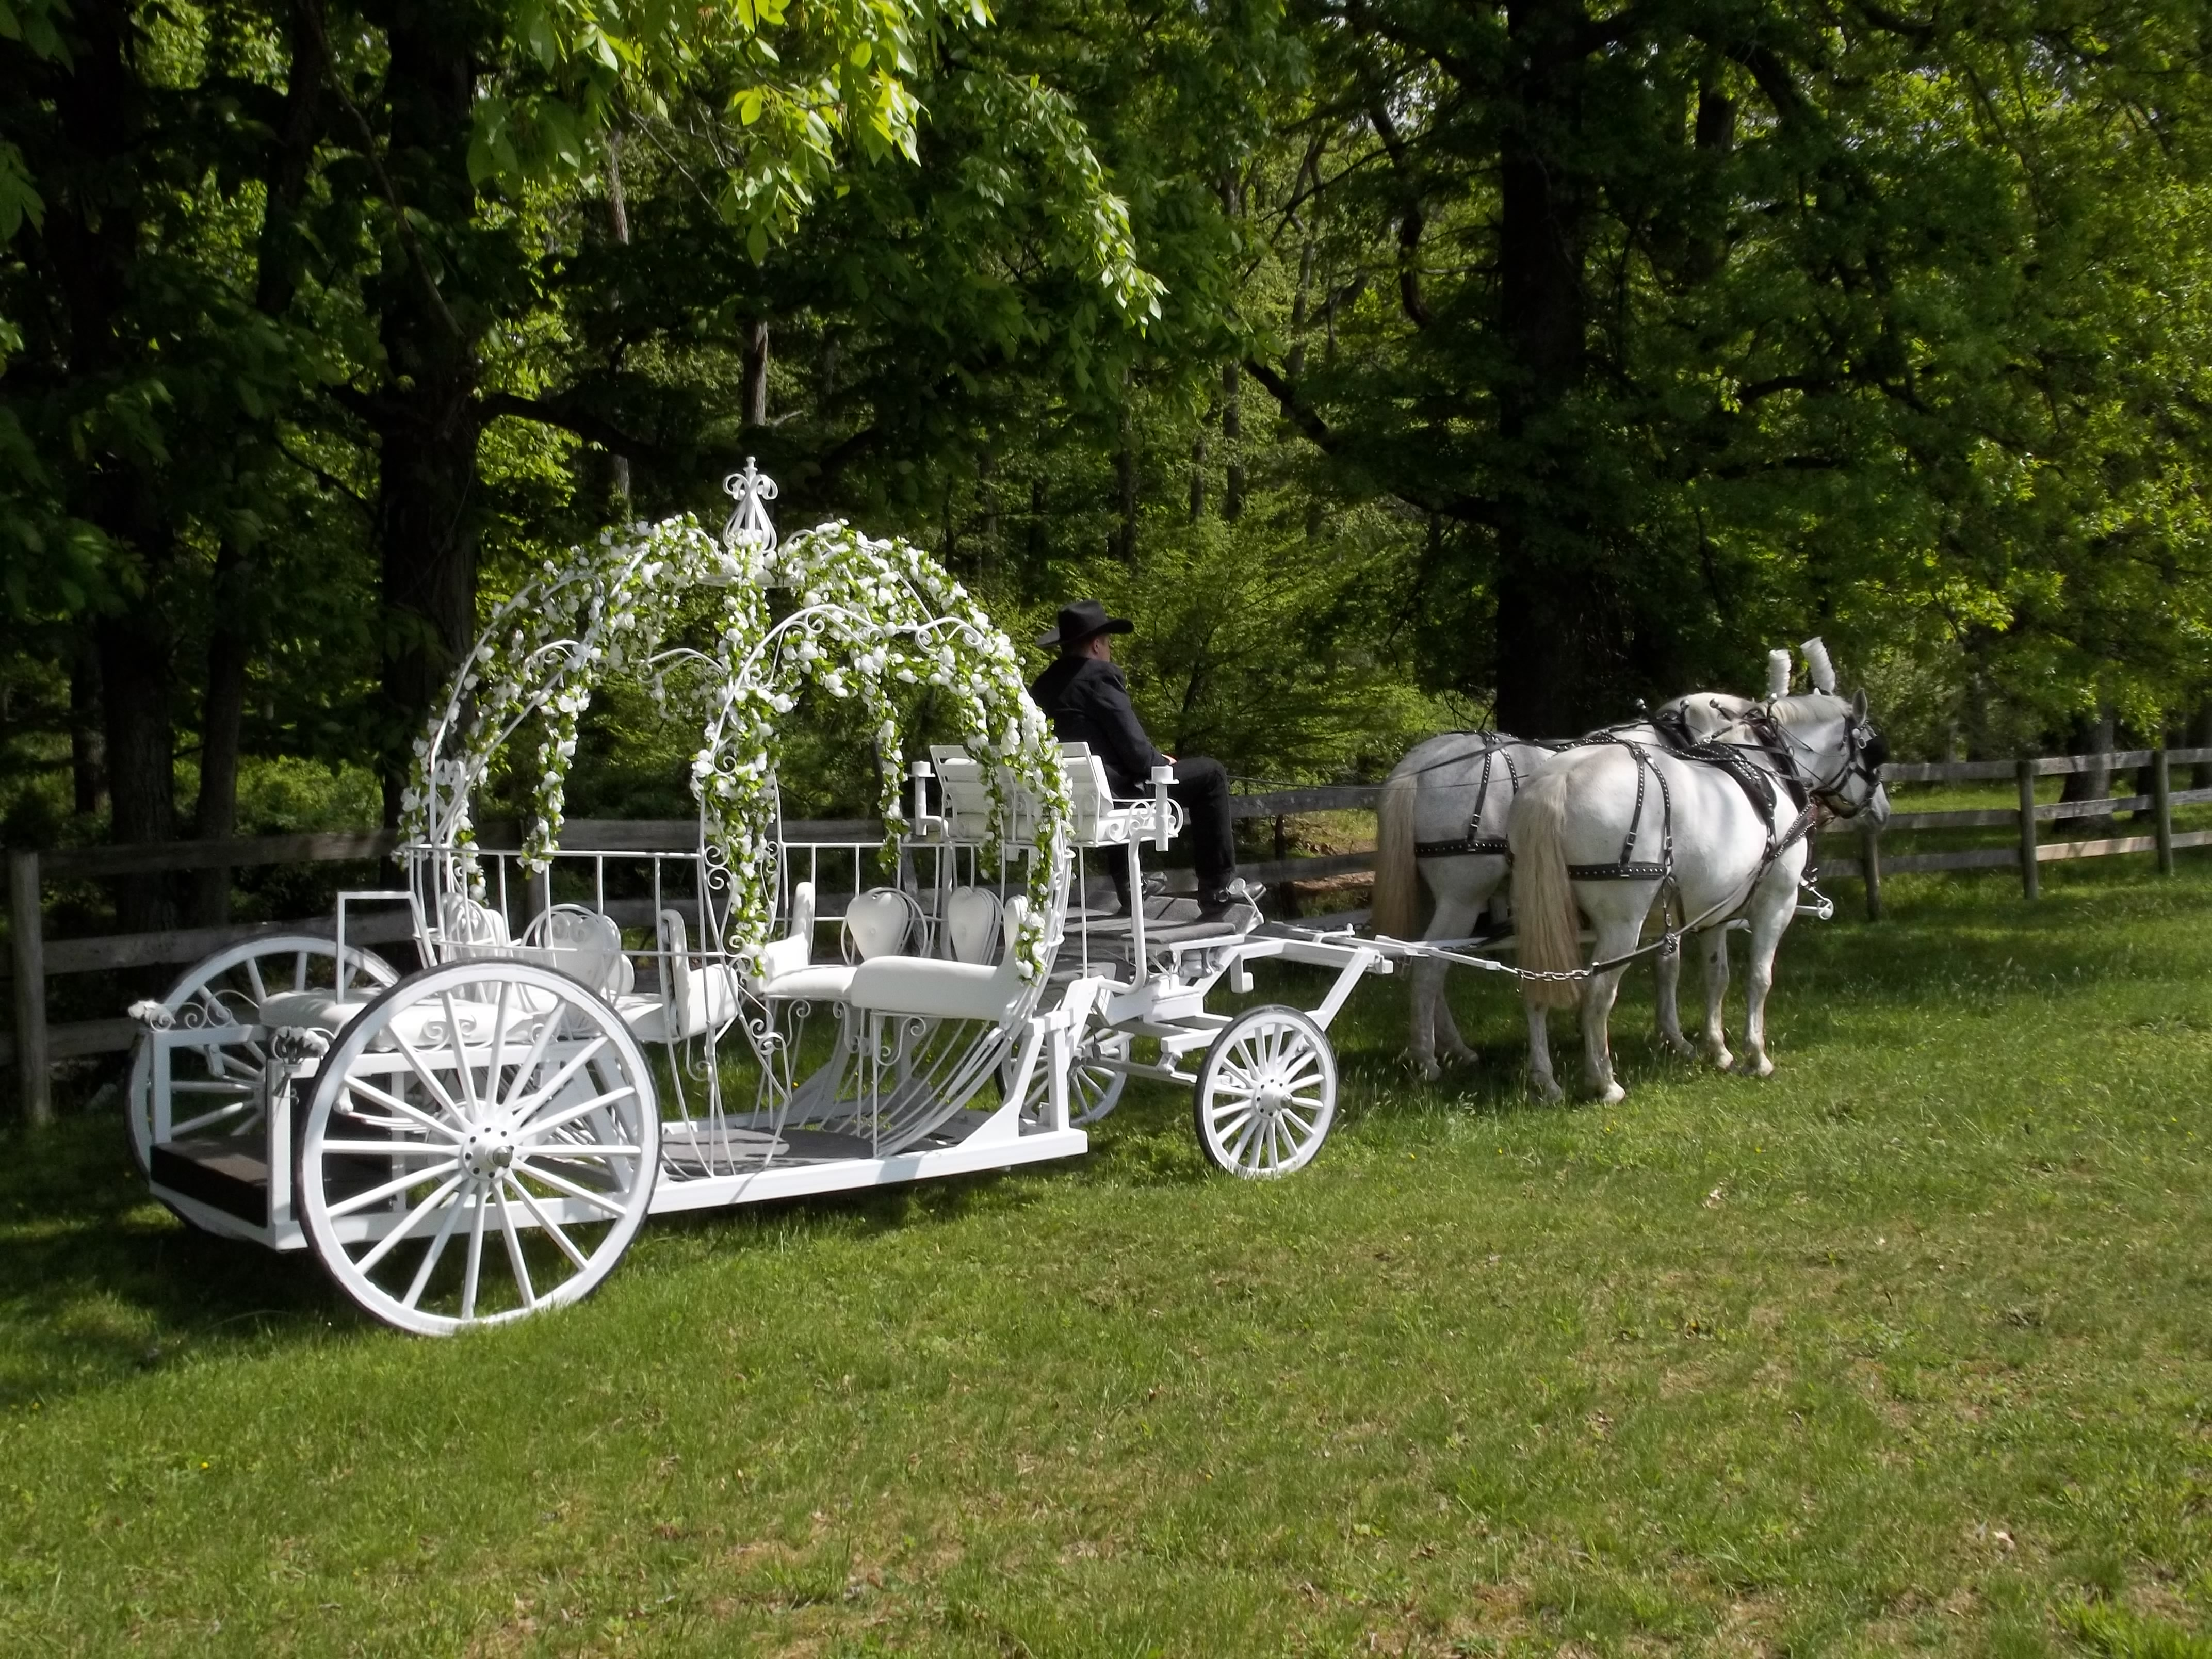 Horse Carriage Wedding Rental Nj Carriage Rides Cloverland